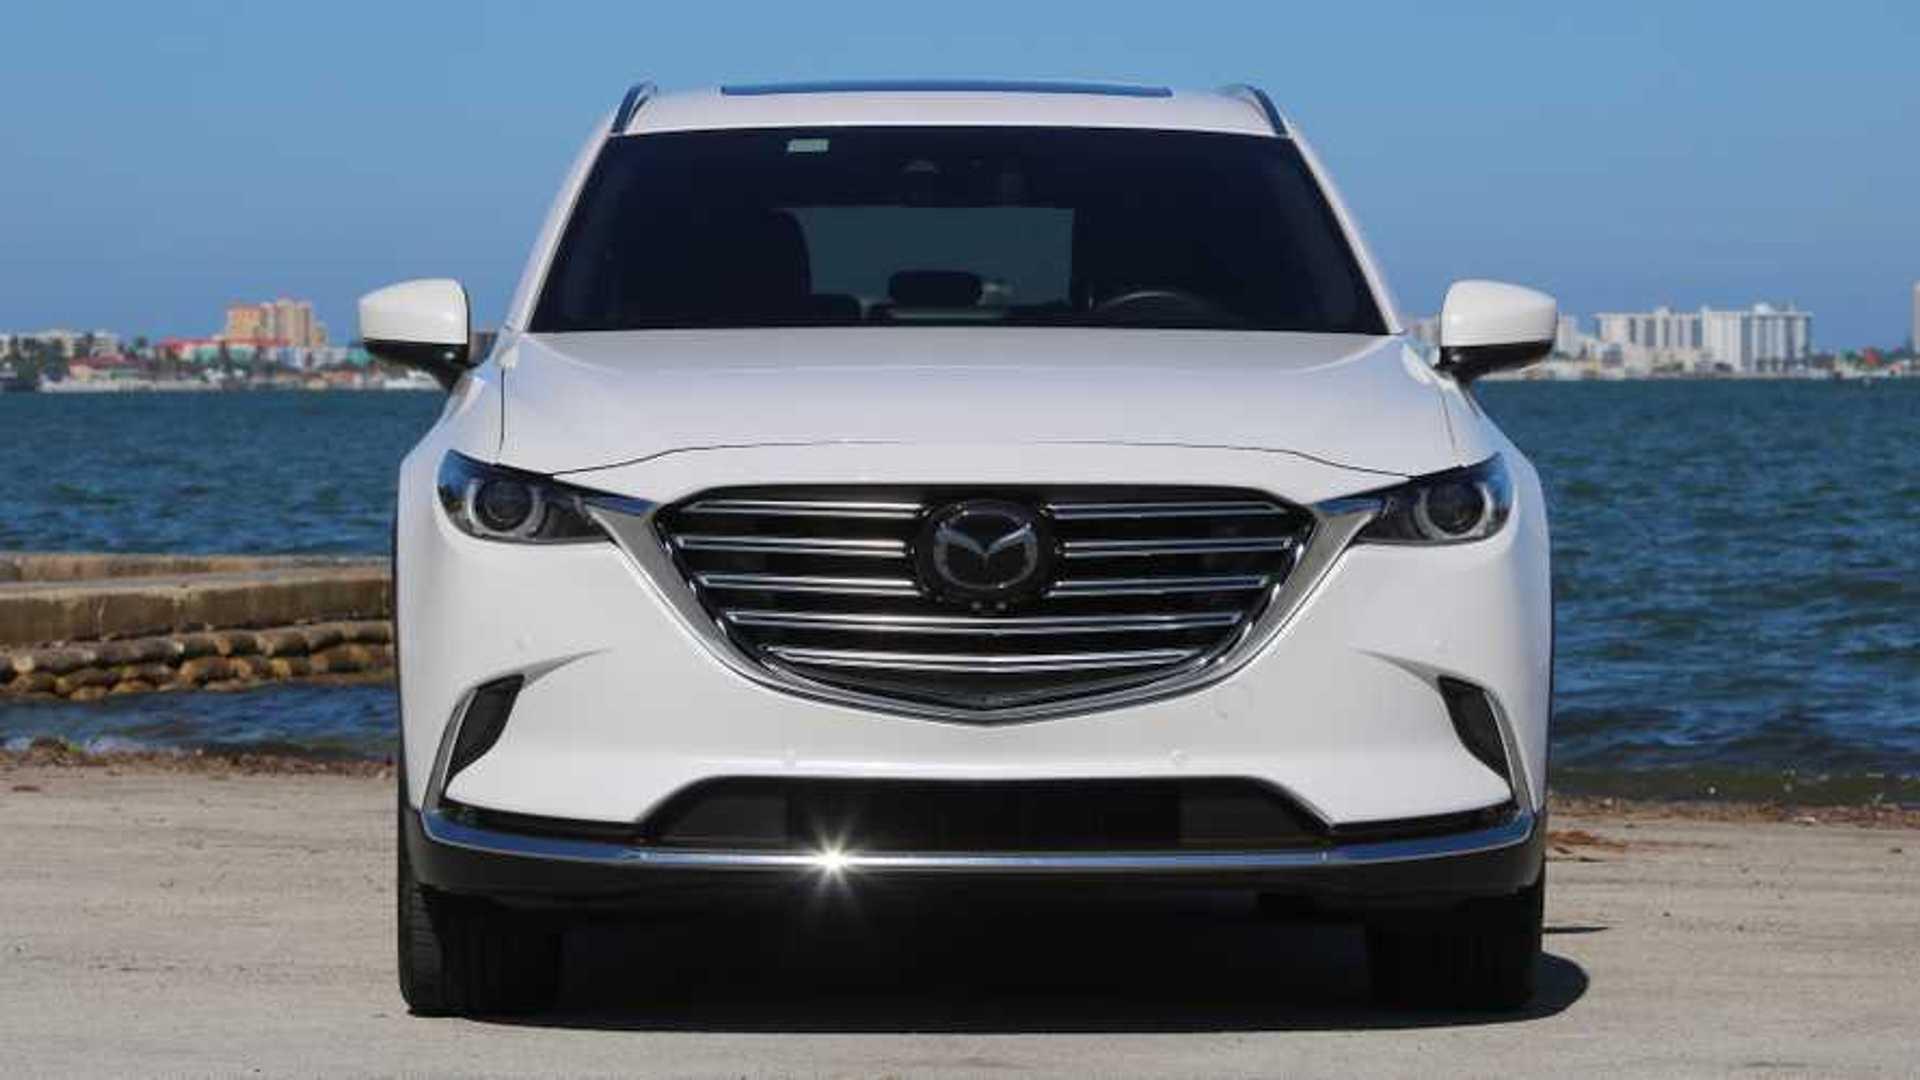 2019 Mazda CX-9 Signature AWD: Pros And Cons